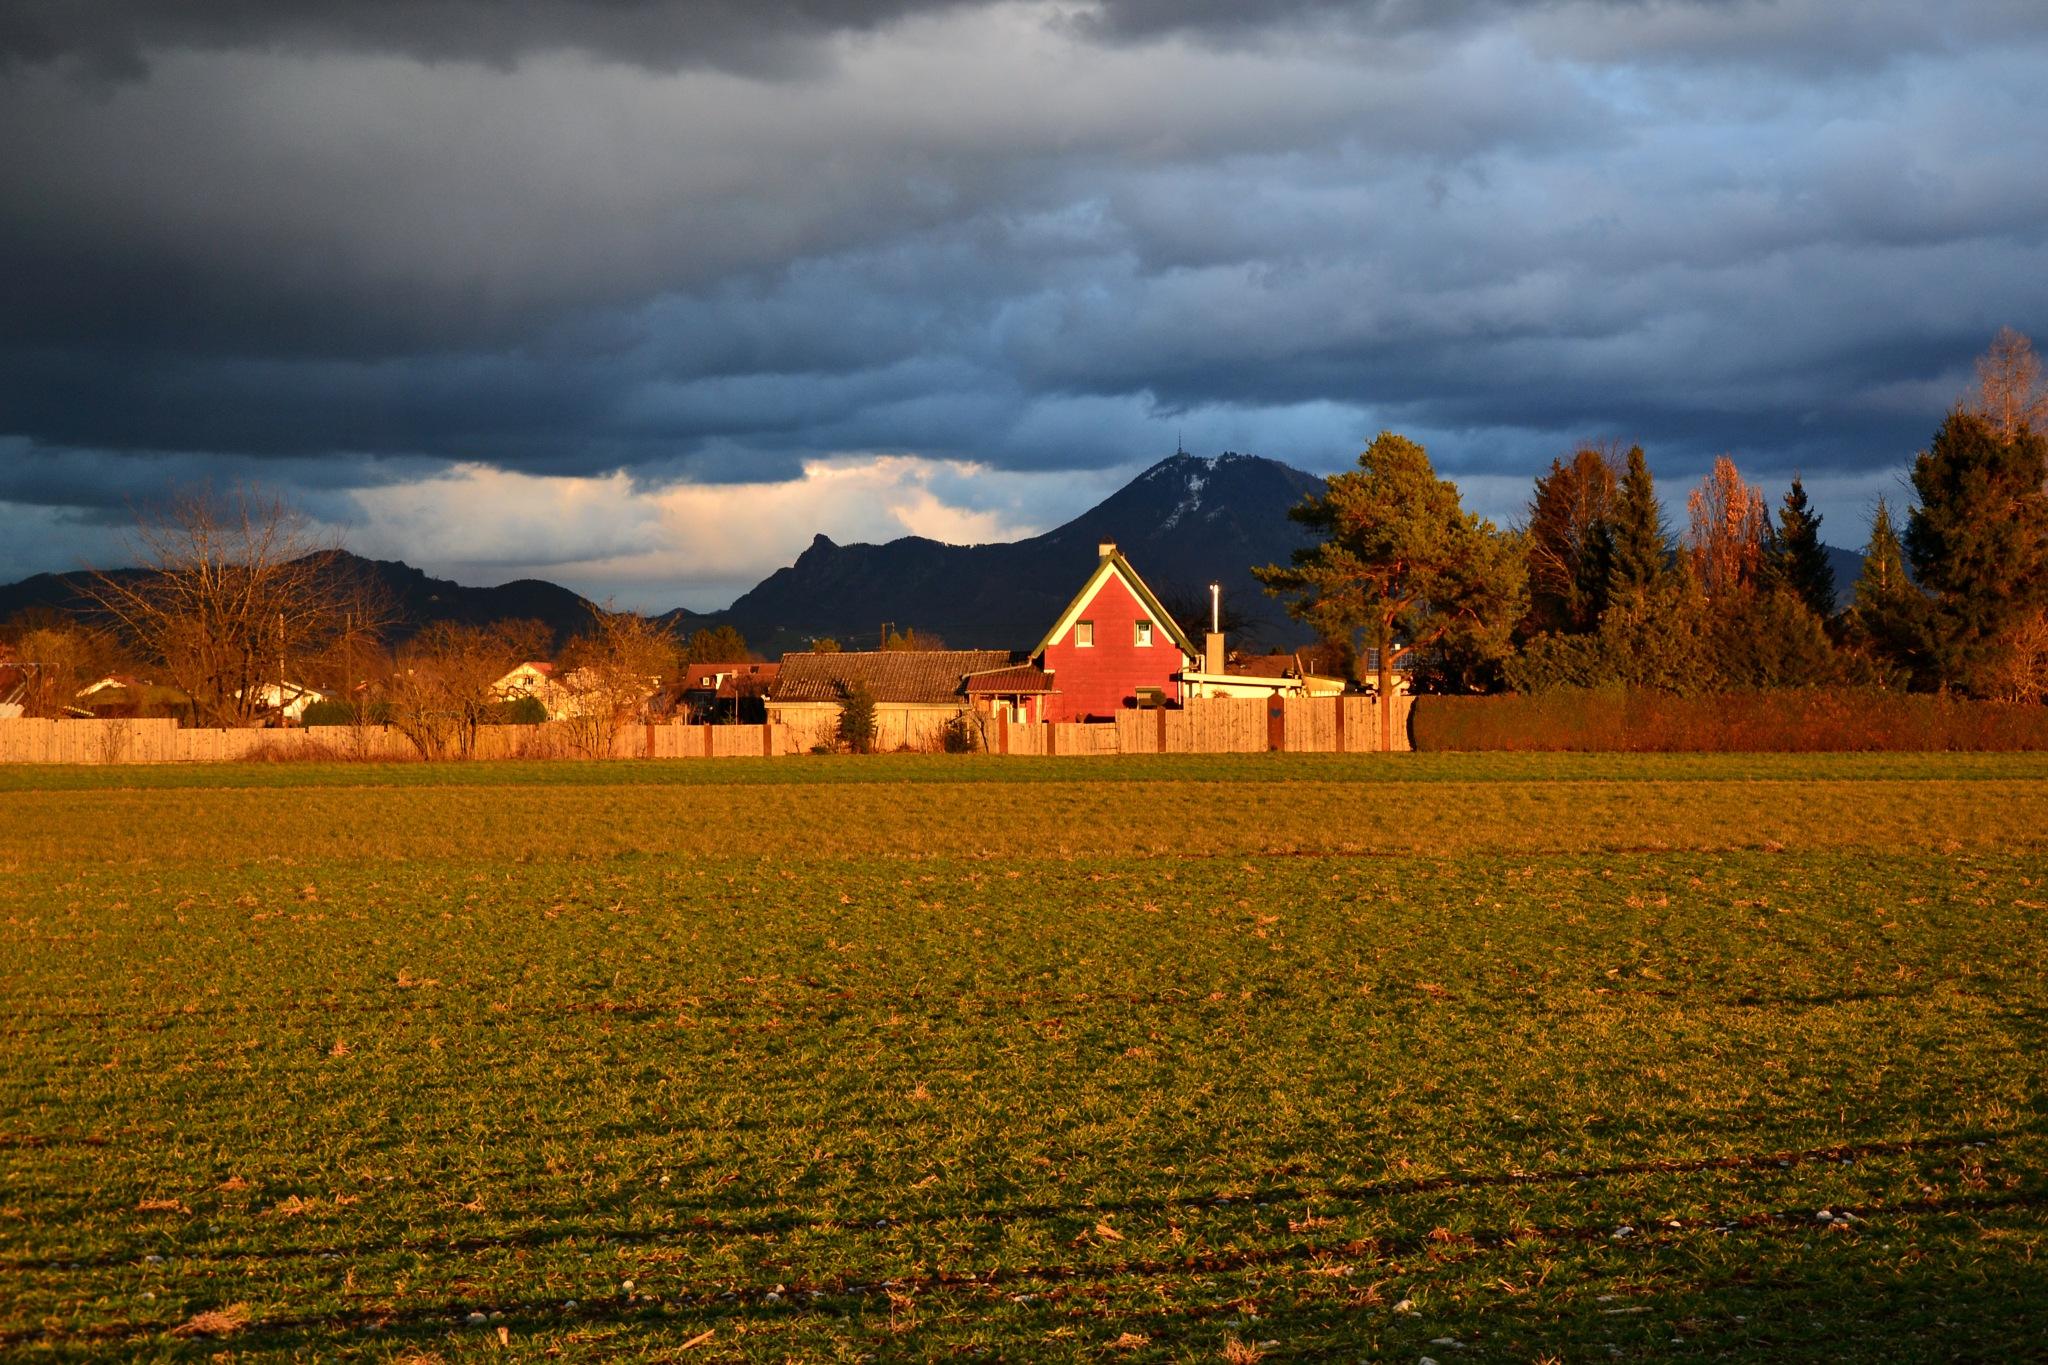 Evening sunlight and dark clouds by echumachenco